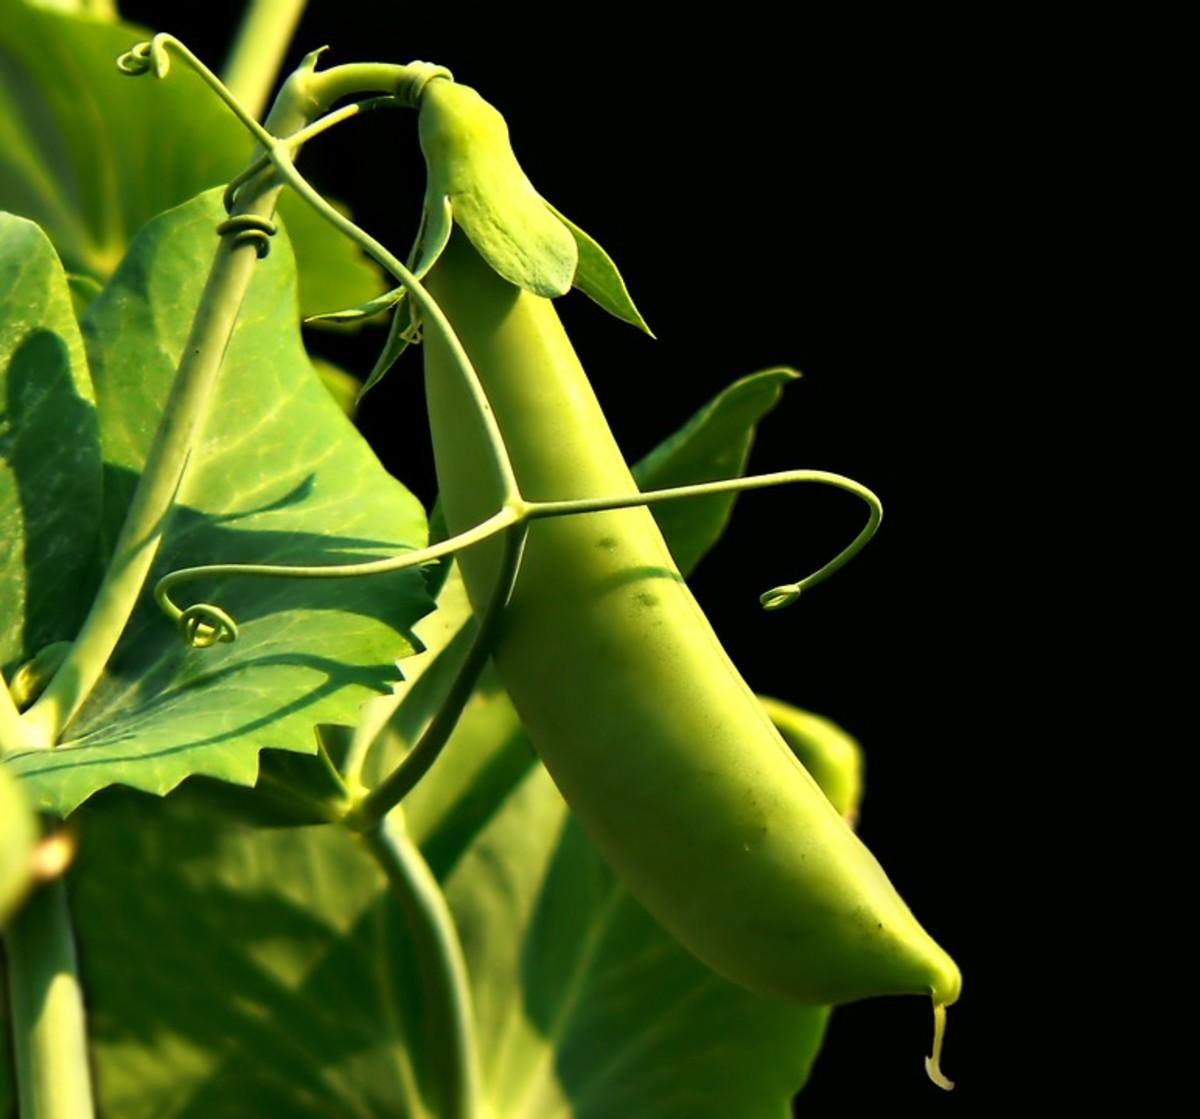 legume-protein-powders